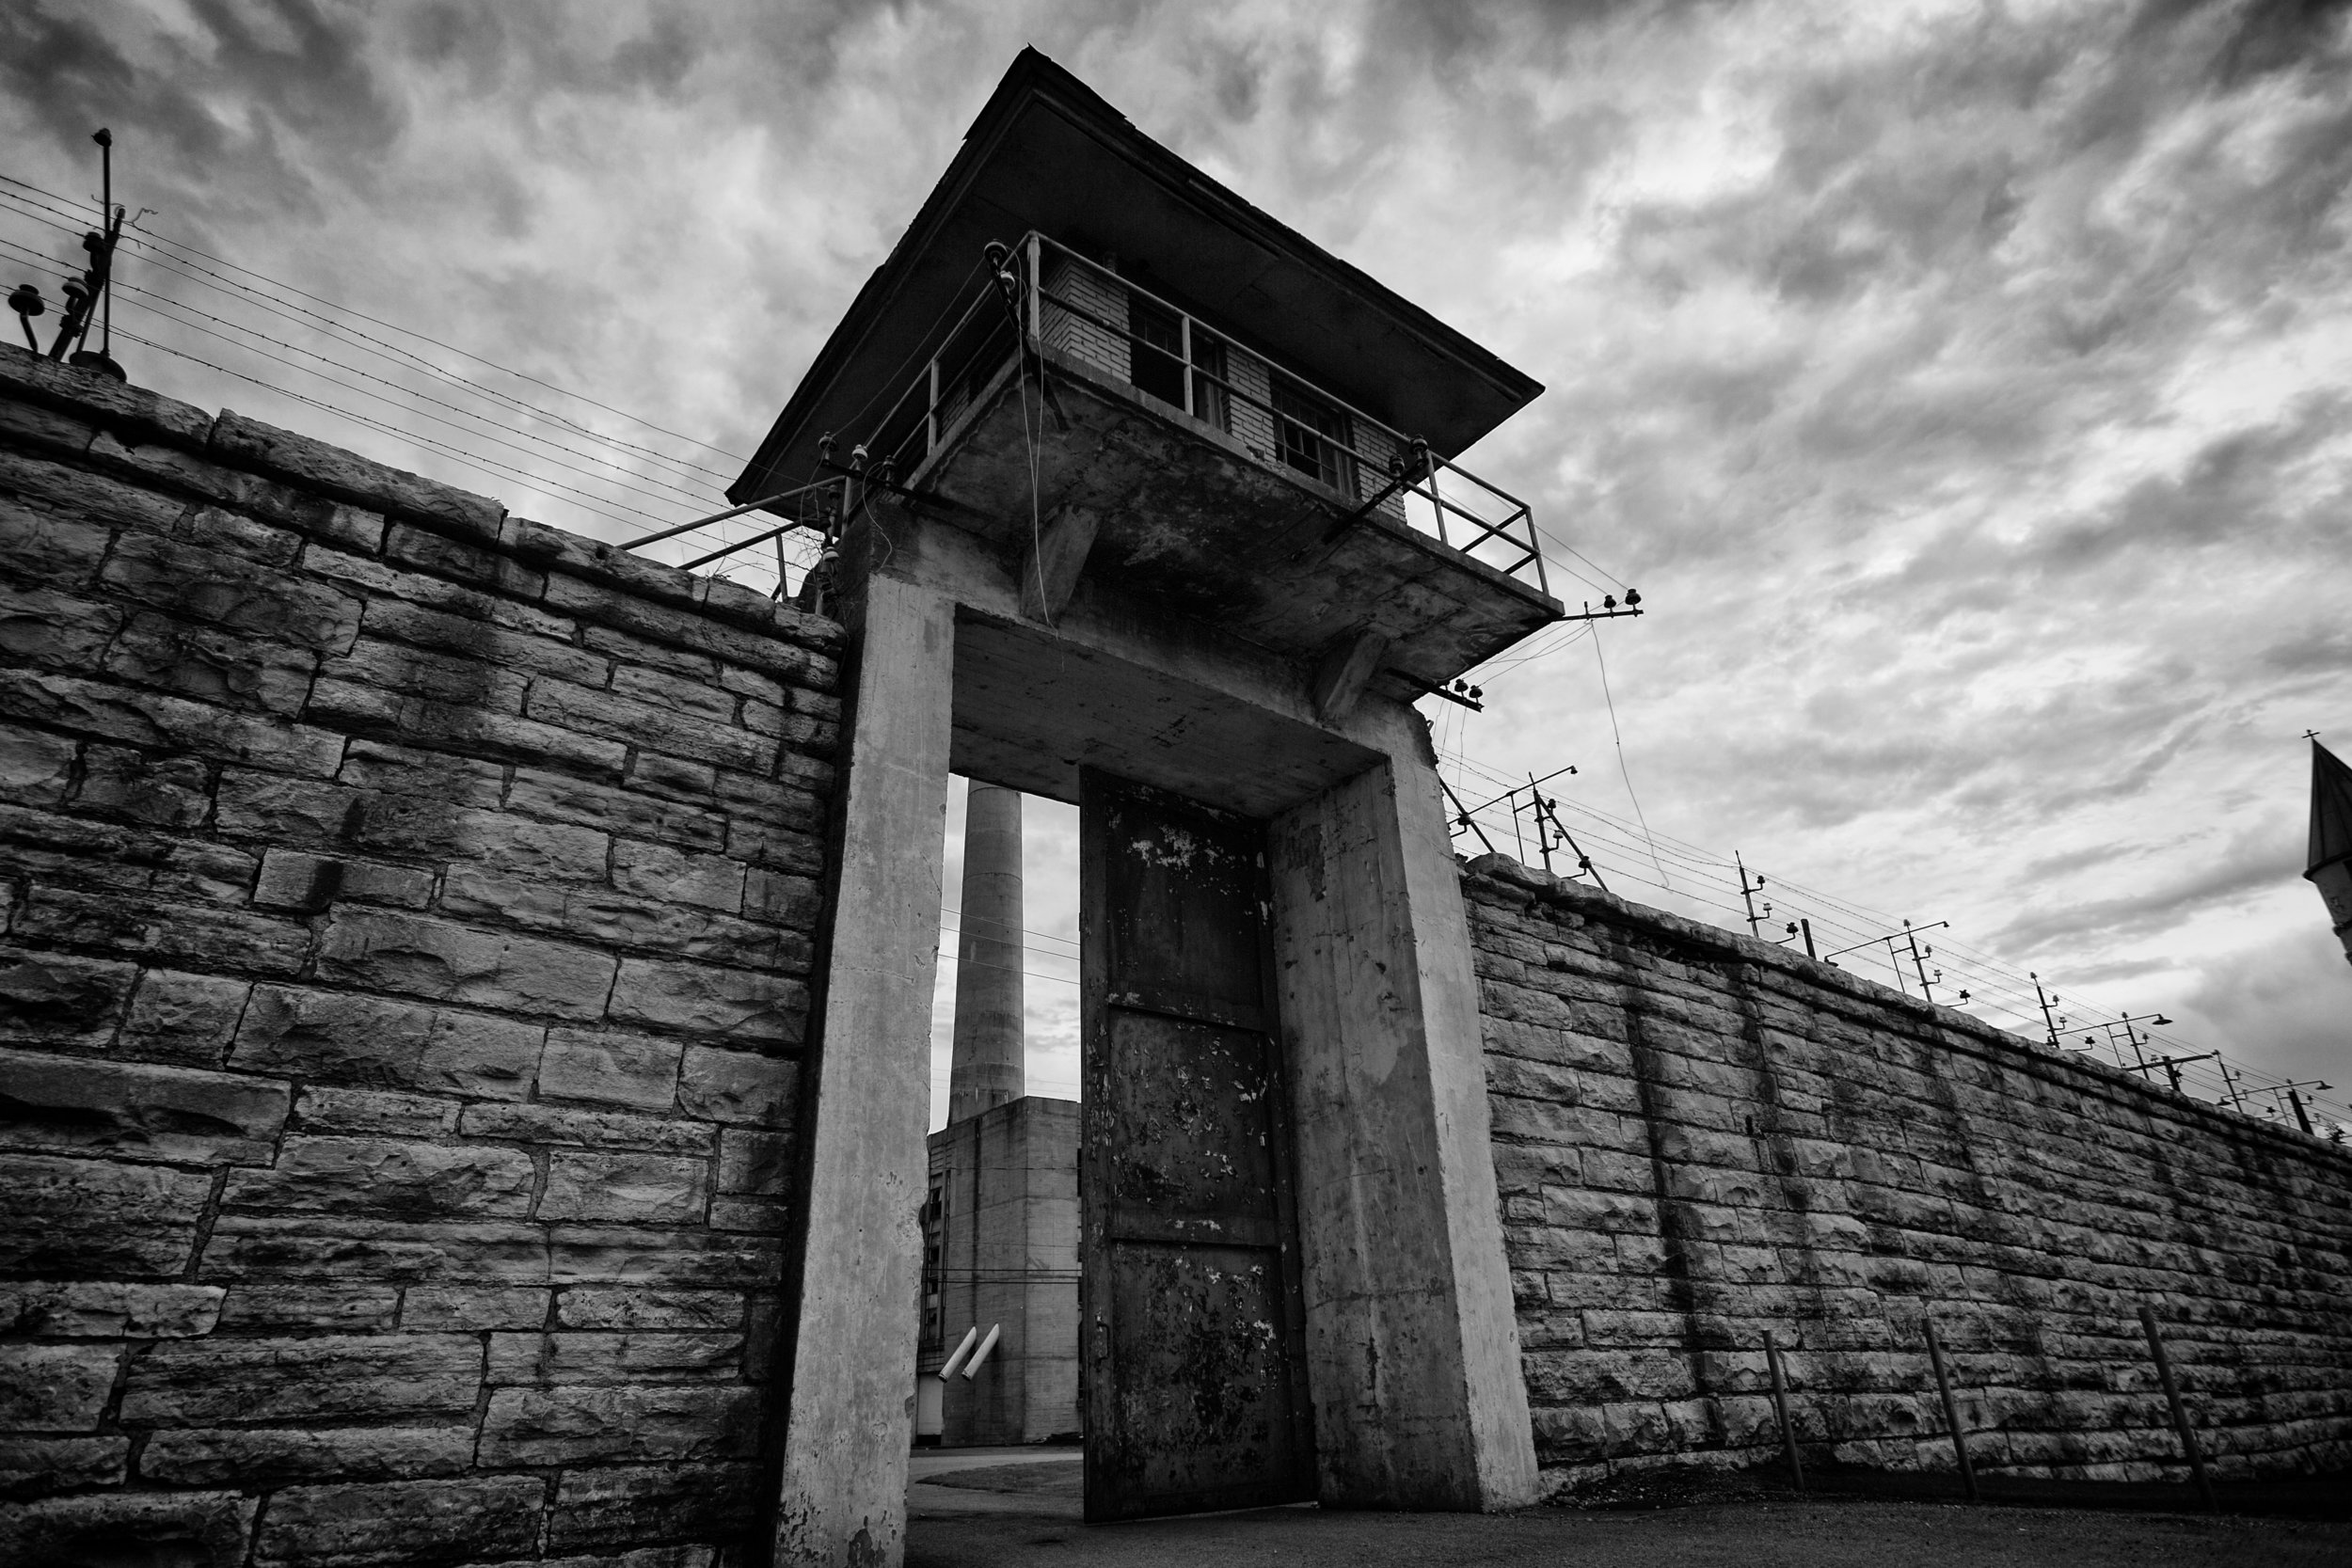 Reframe Studios - We make individual films that advocate for reduced prison sentences.